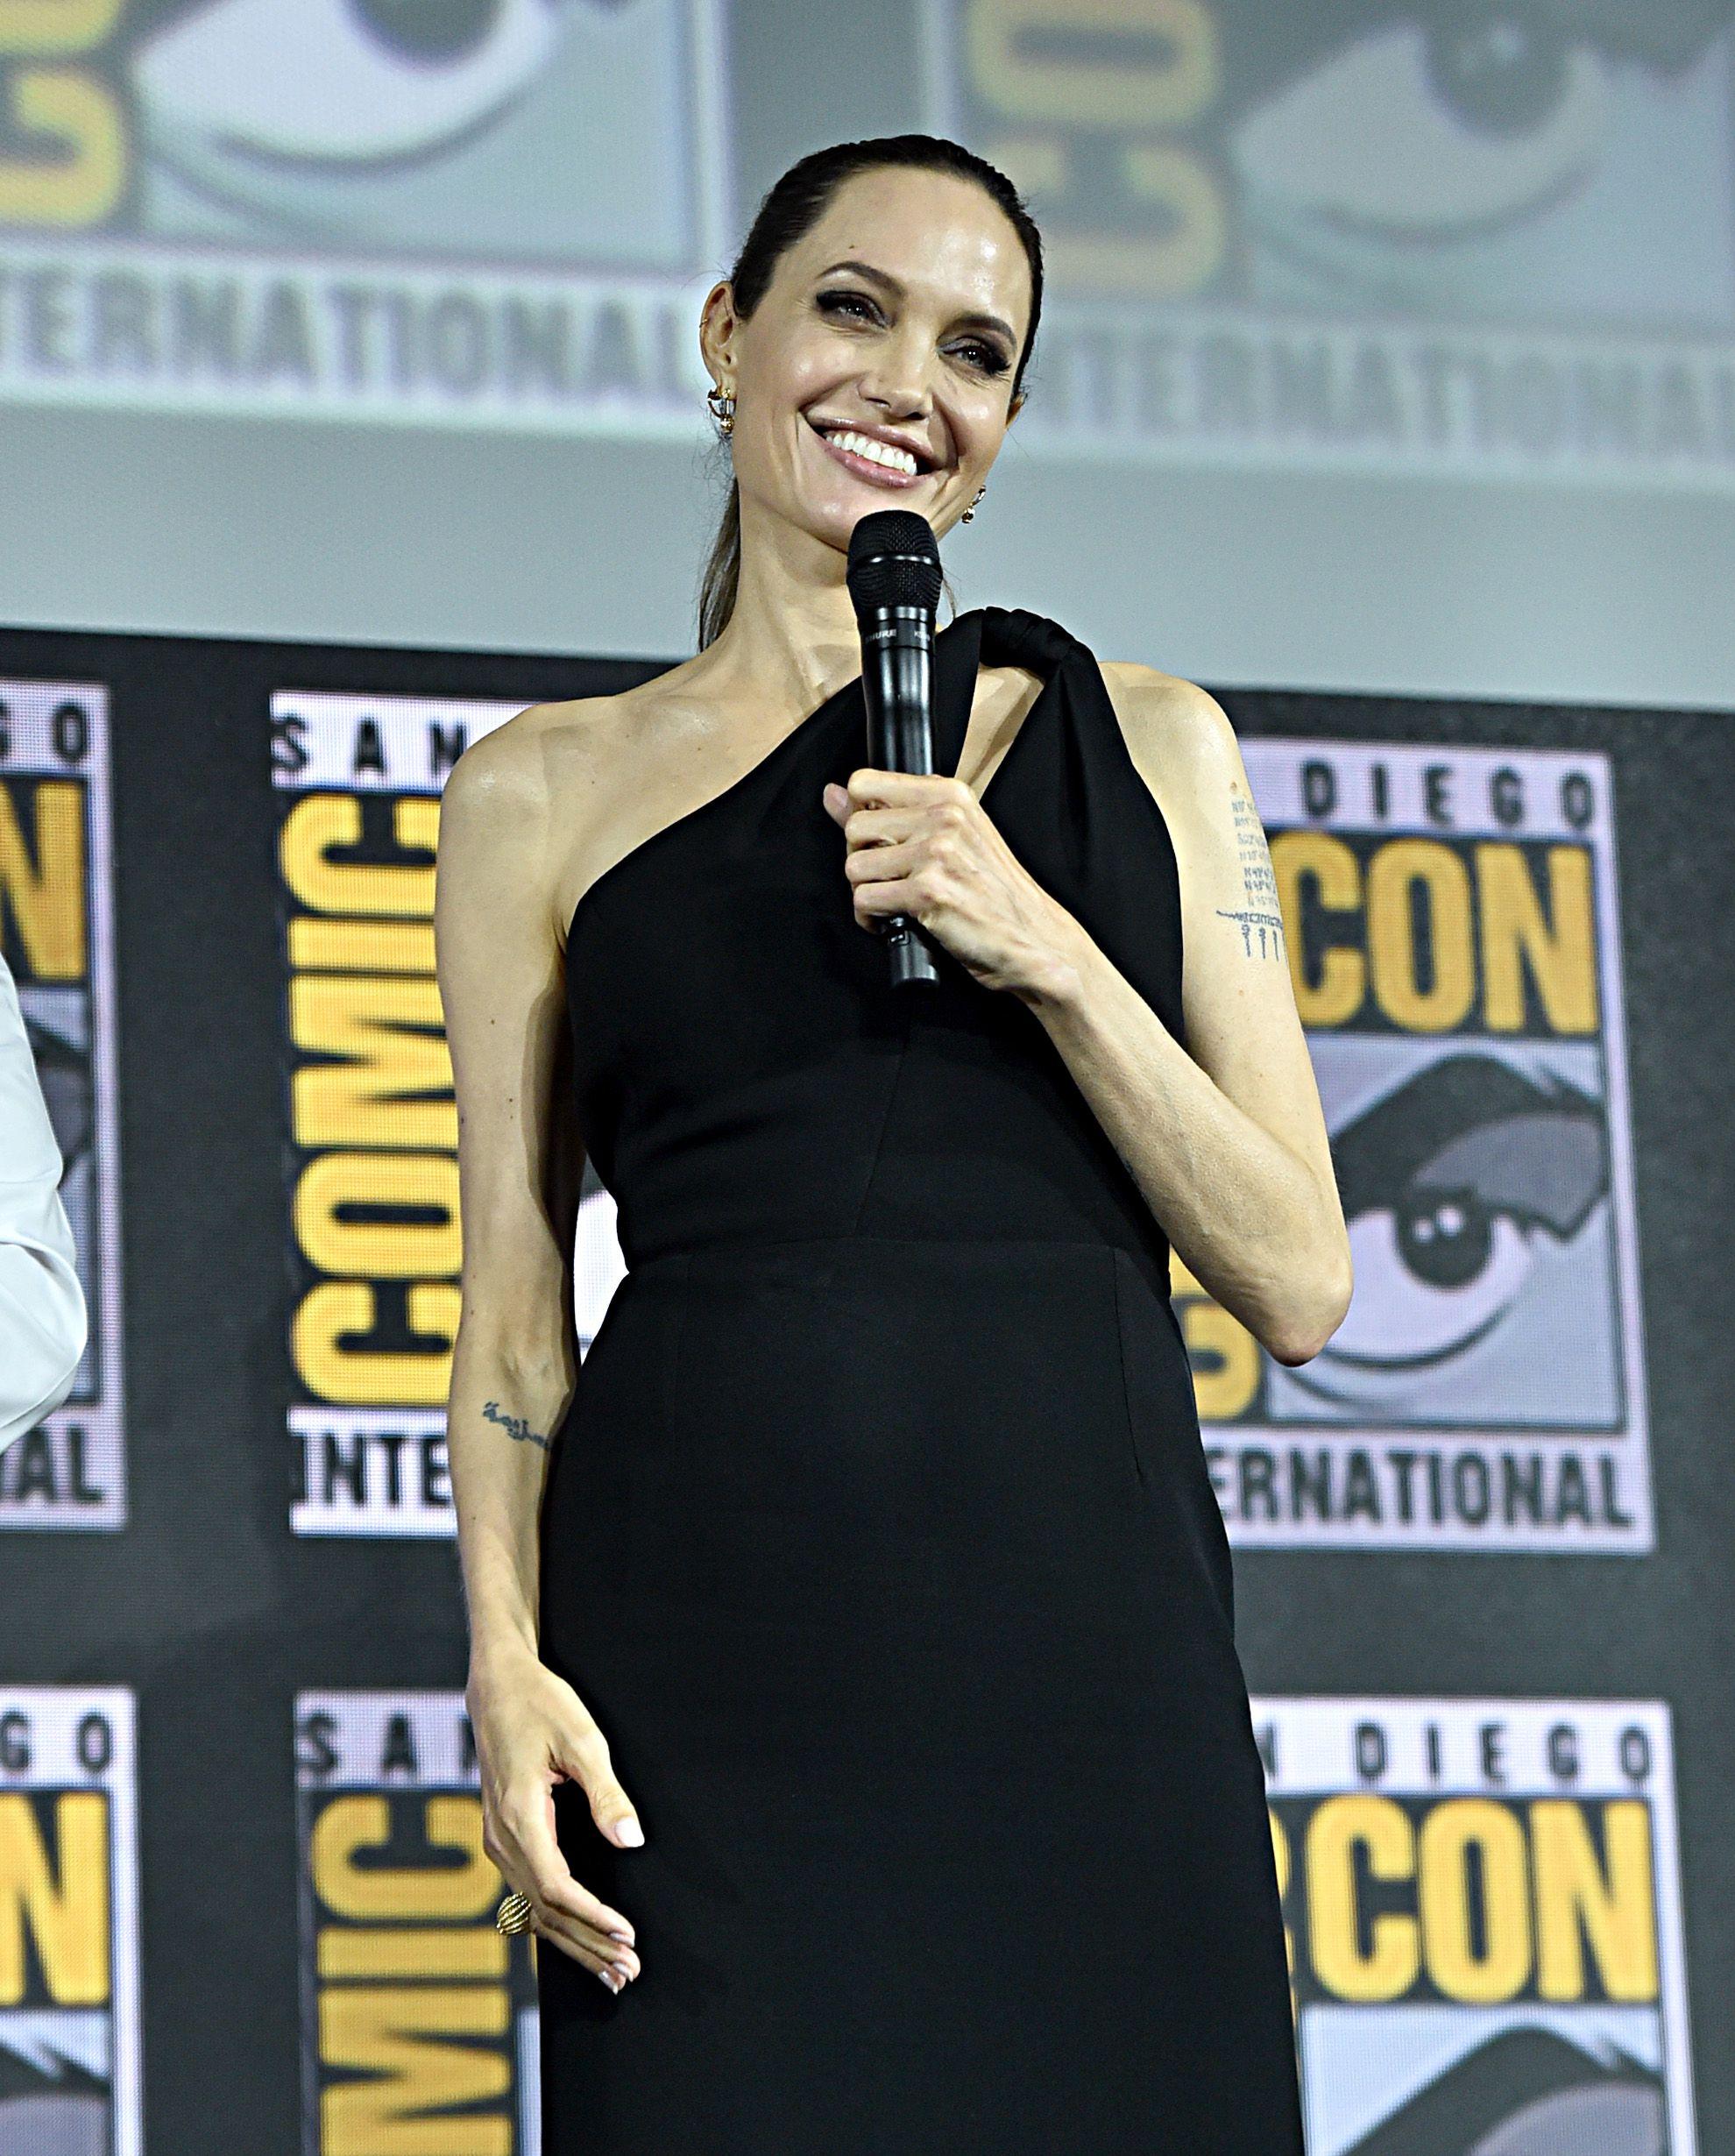 Angelina Jolie Confirms Marvel Superhero Role at Comic Con ...